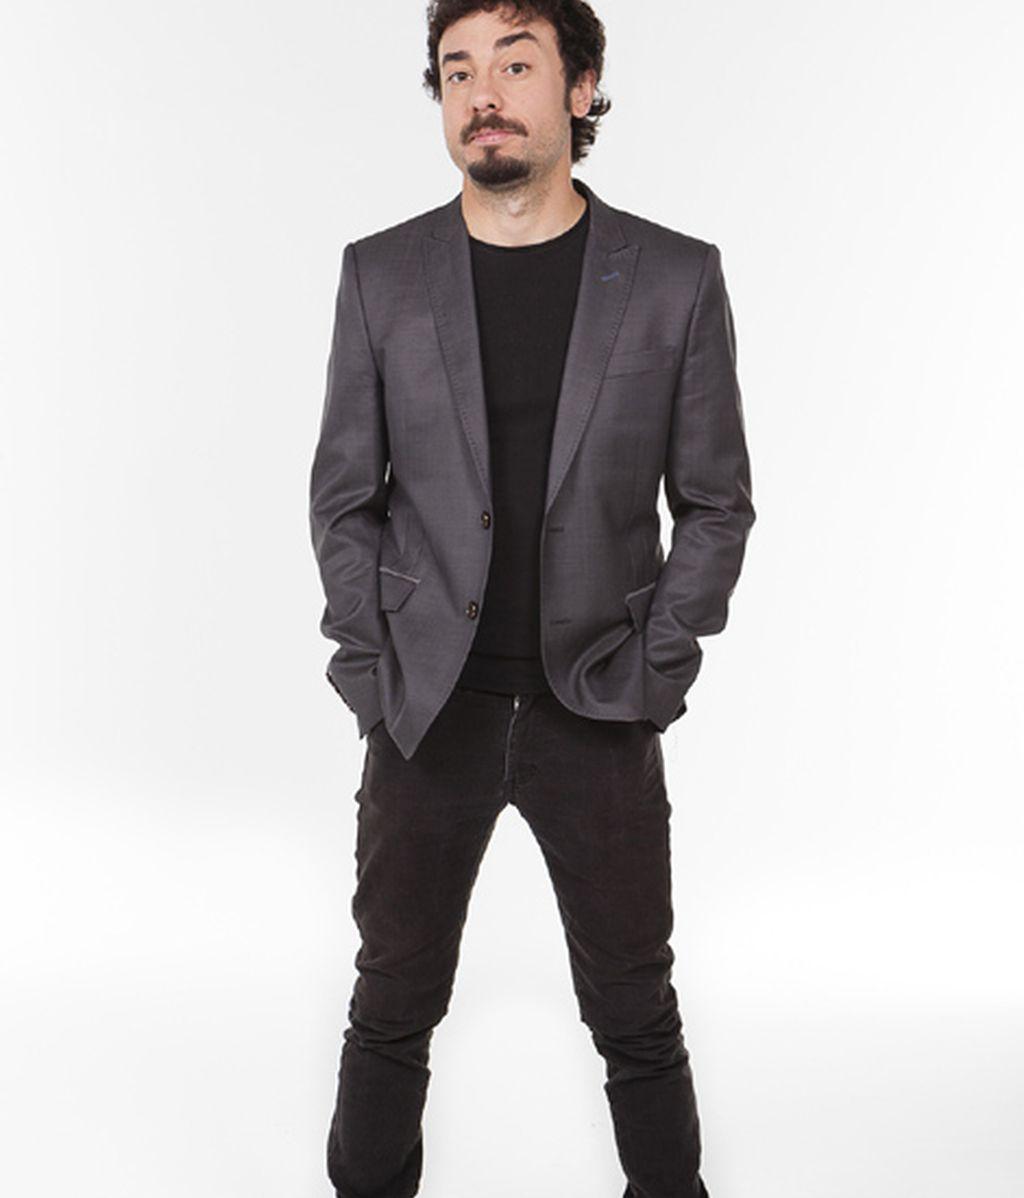 Danny Boy-Rivera